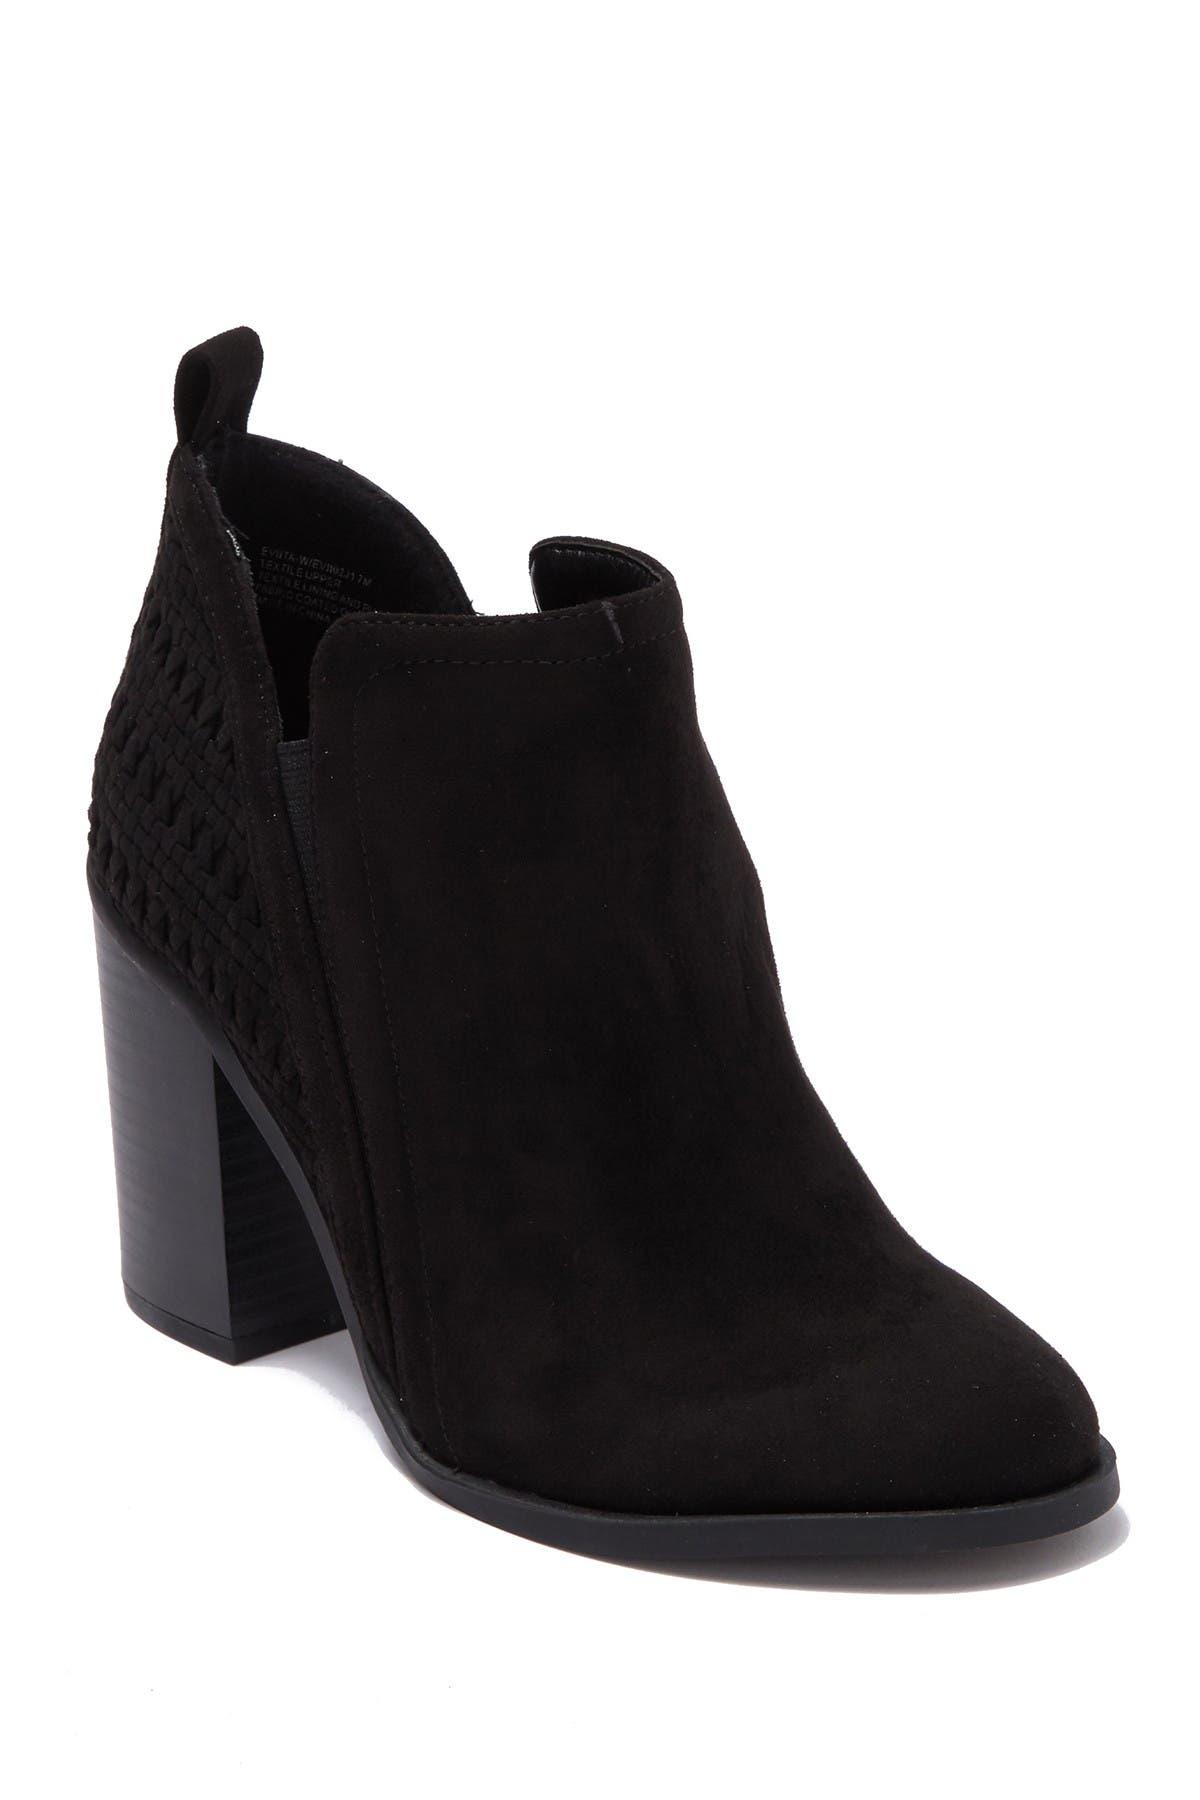 Madden Girl | Eviita Woven Ankle Boot